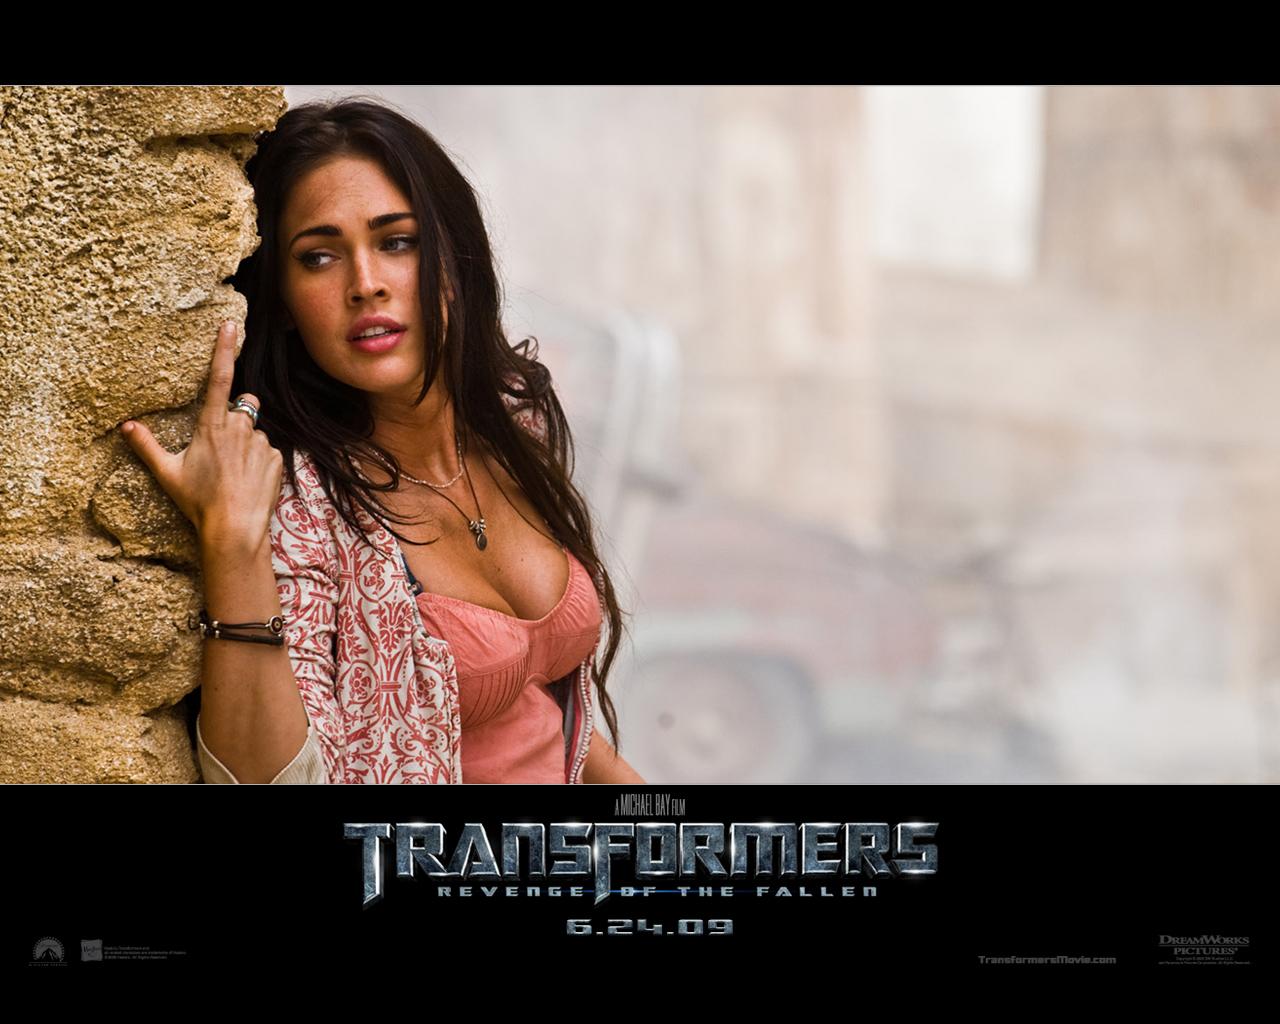 http://1.bp.blogspot.com/_AGs2bLcznPI/TFO7-W_6amI/AAAAAAAAAJ4/DSpdO8wXWec/s1600/Megan_Fox_in_Transformers.jpg